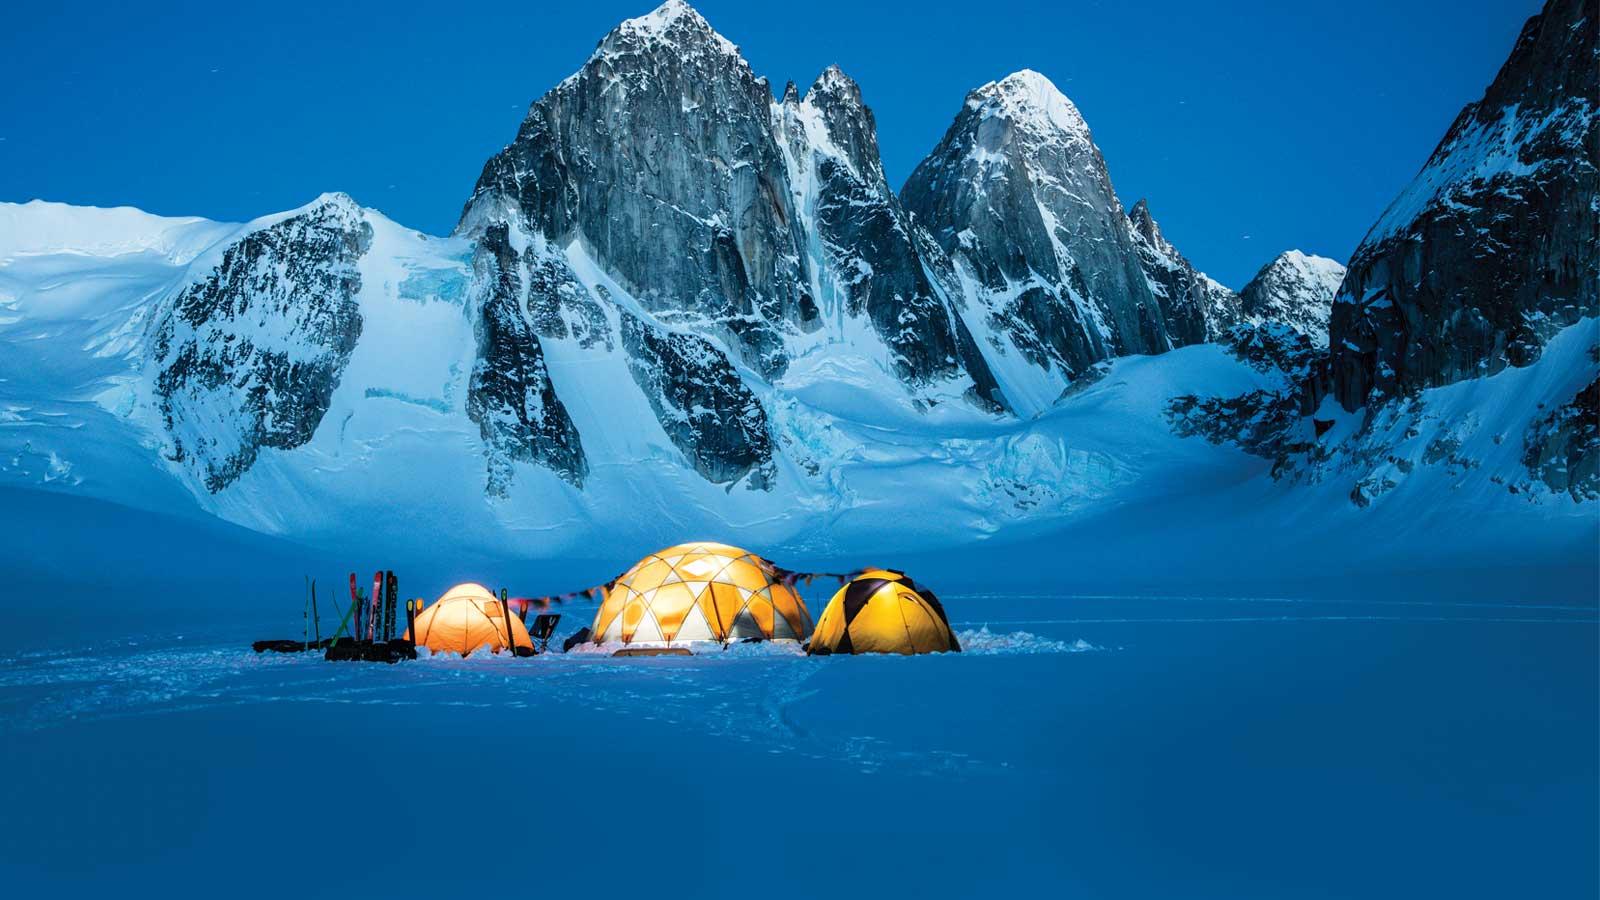 Banff Mountain Film Festival 2022